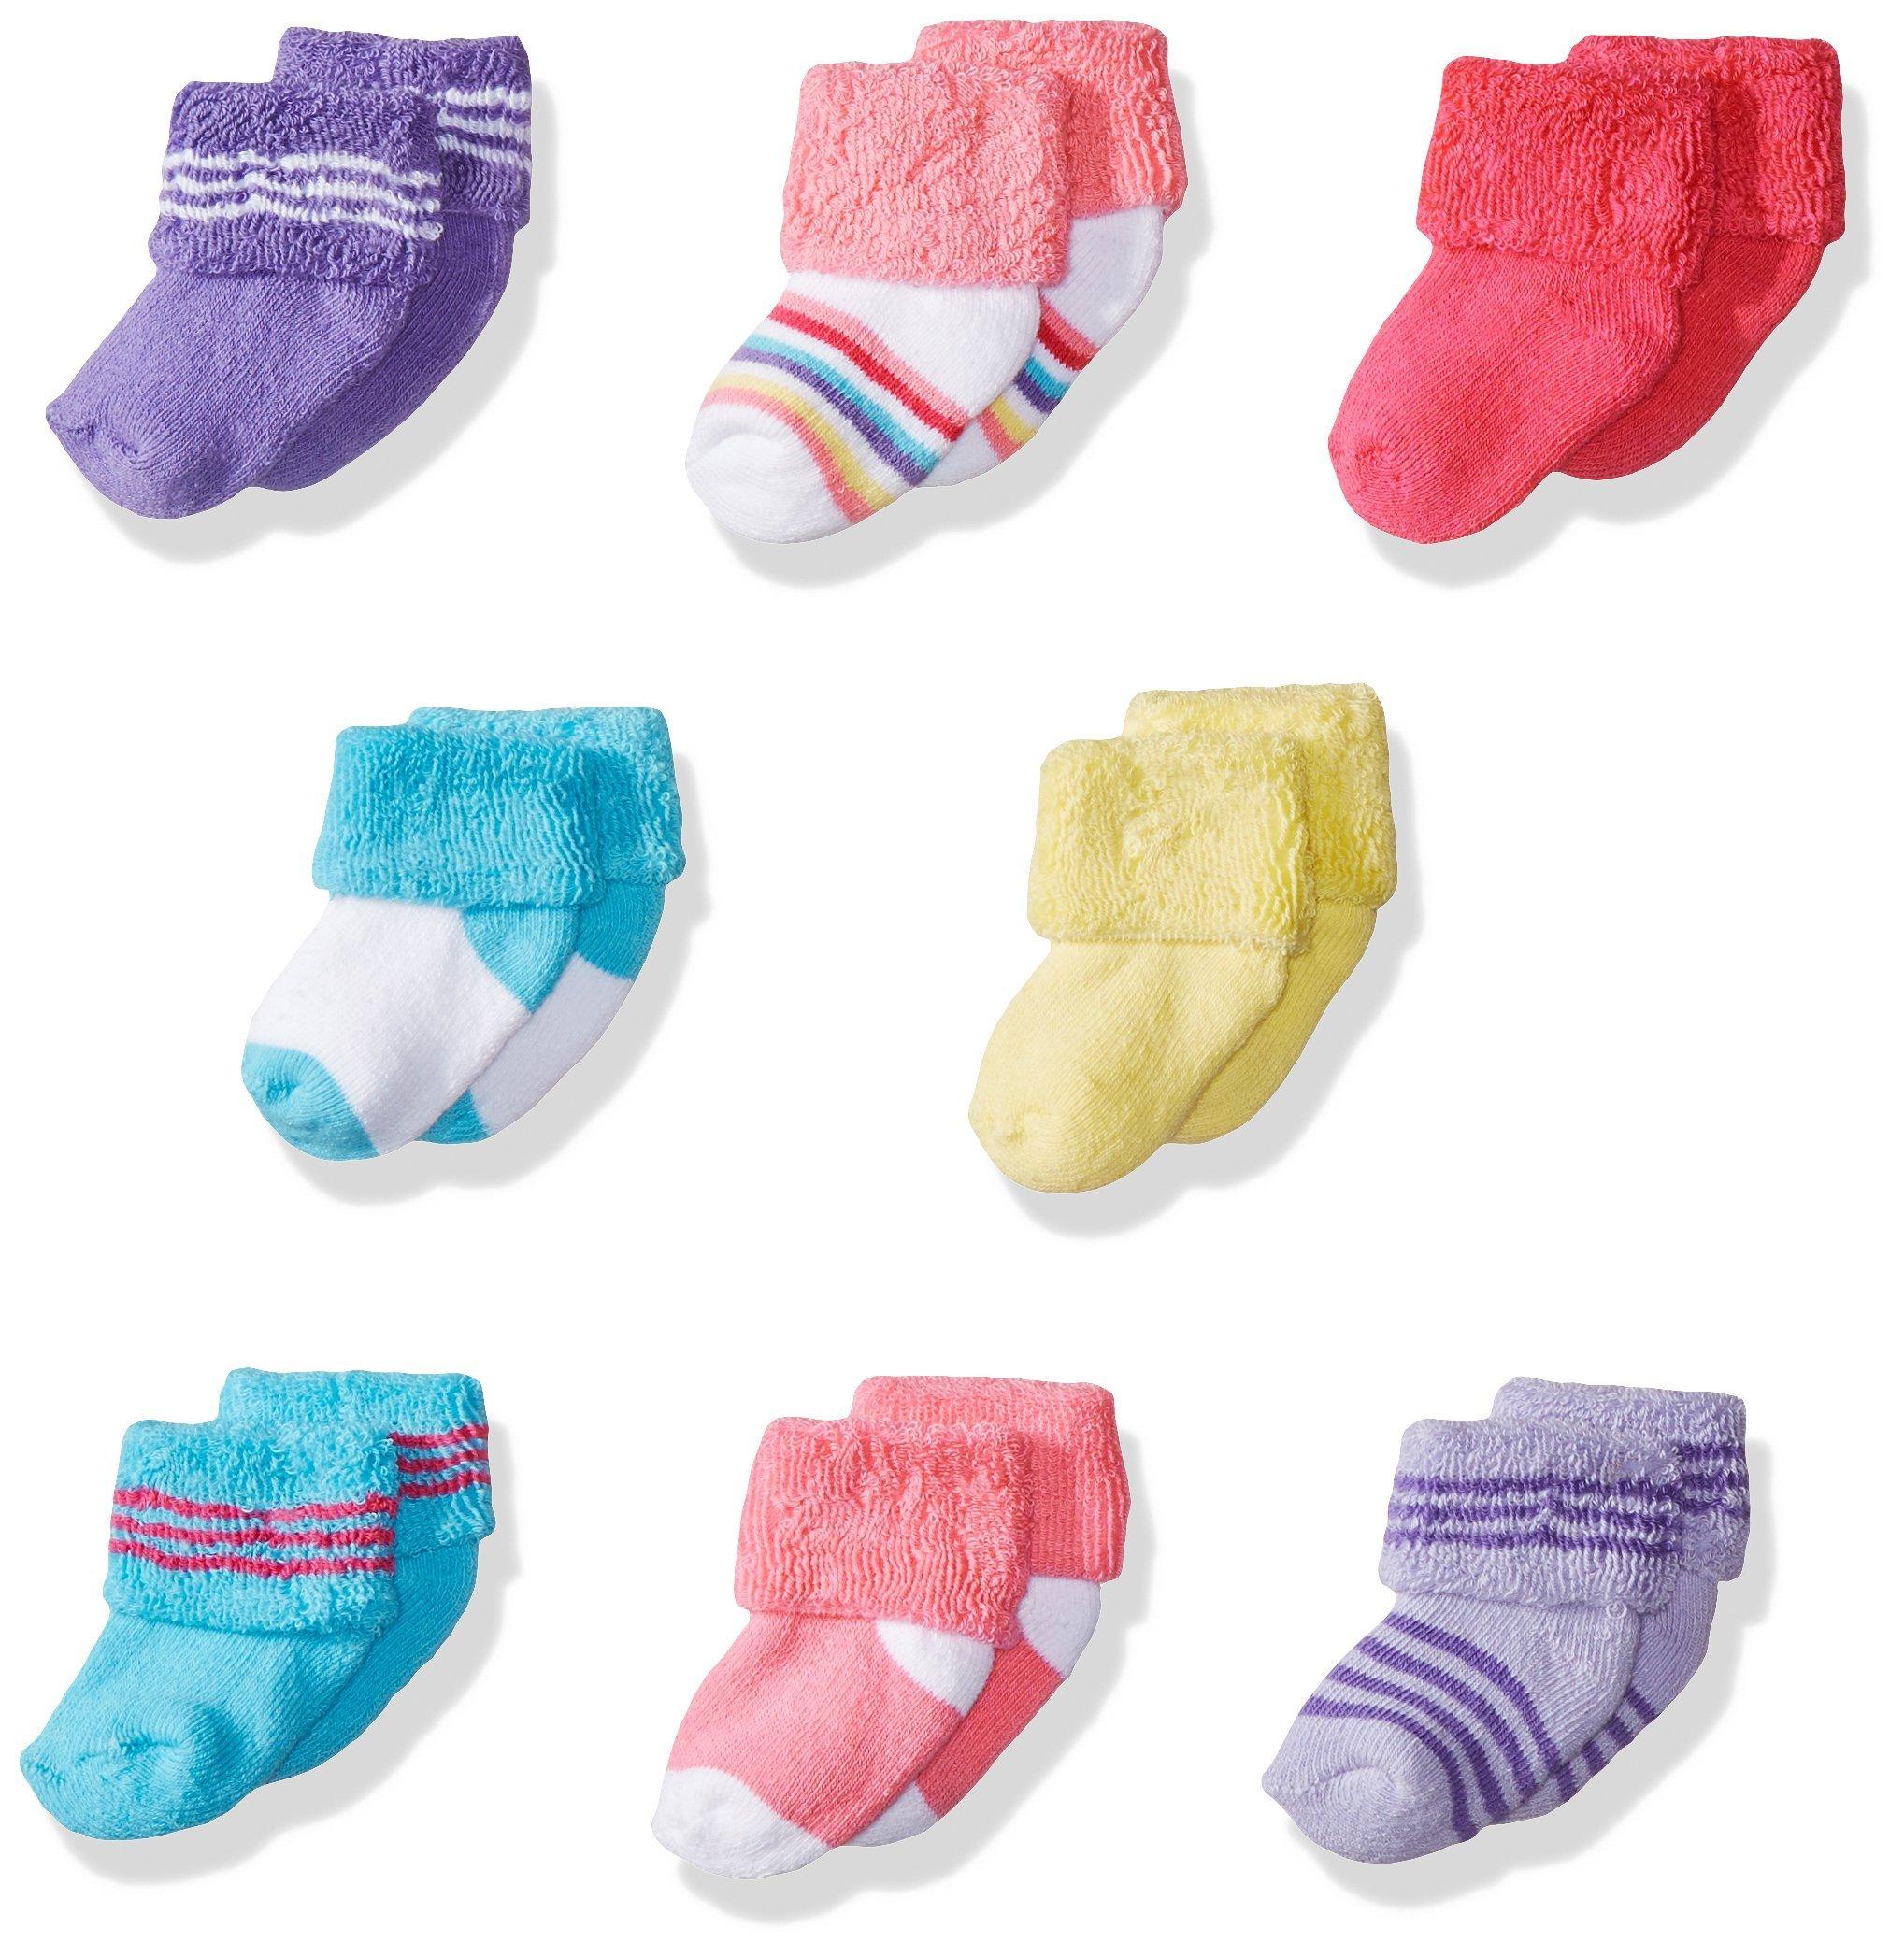 Luvable Friends Unisex 8 Pack Newborn Socks, Pink